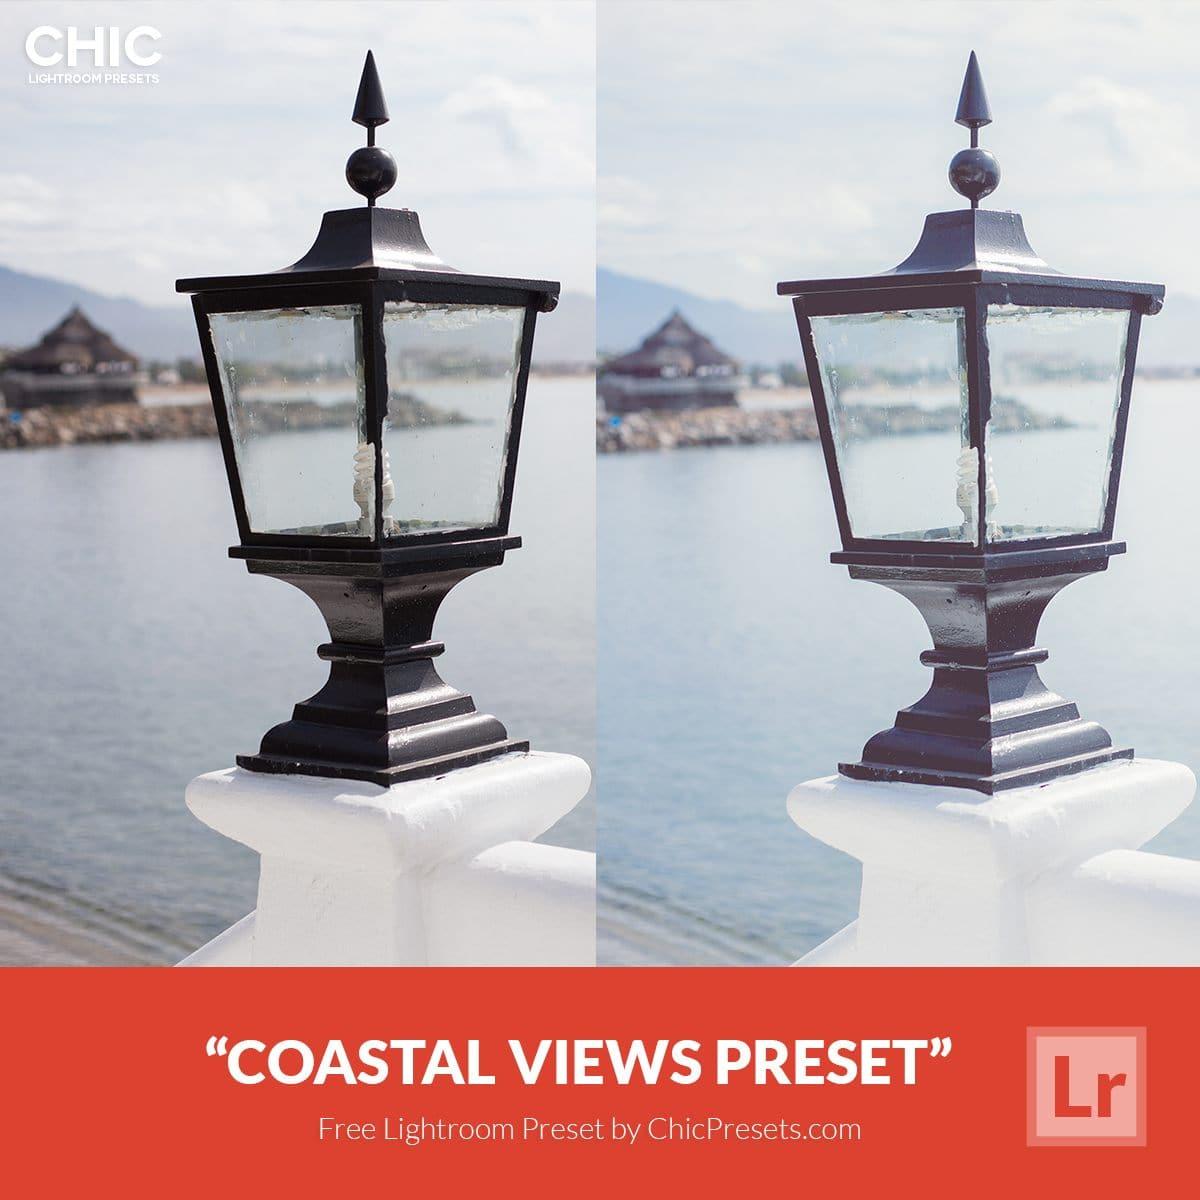 Free-Lightroom-Preset-Coastal-Views